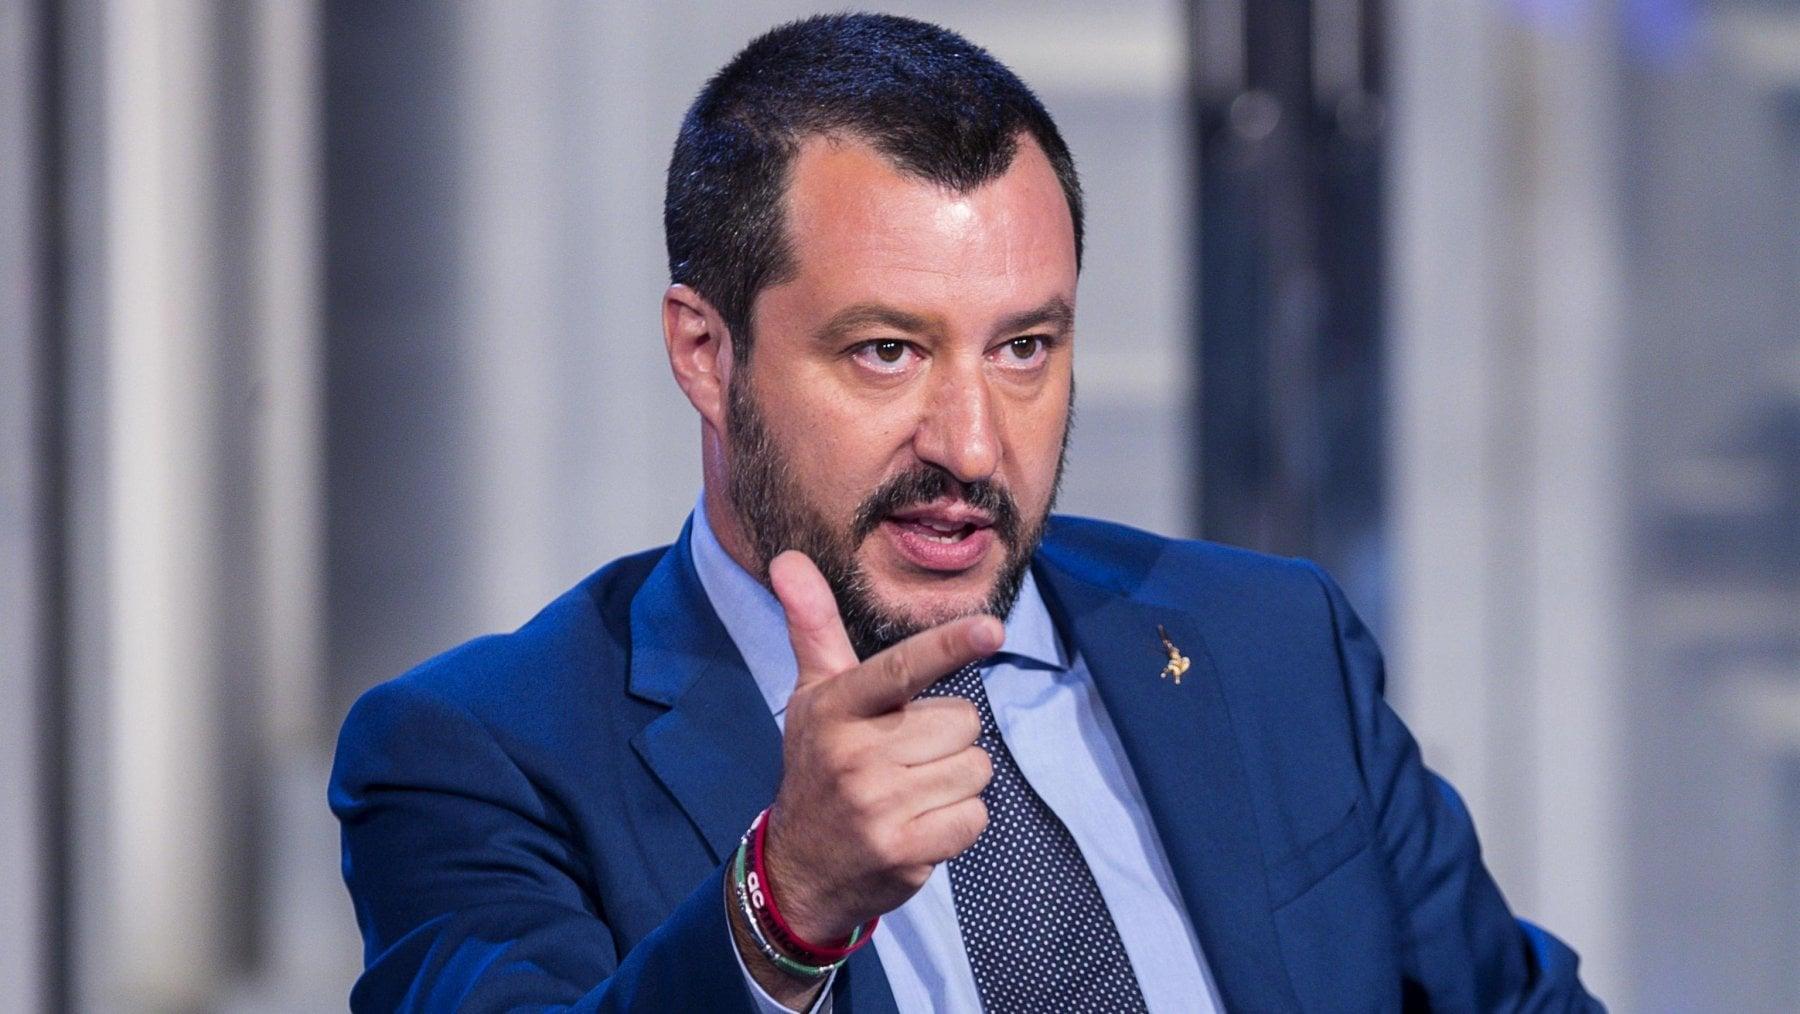 Migranti, Macron vs Salvini: